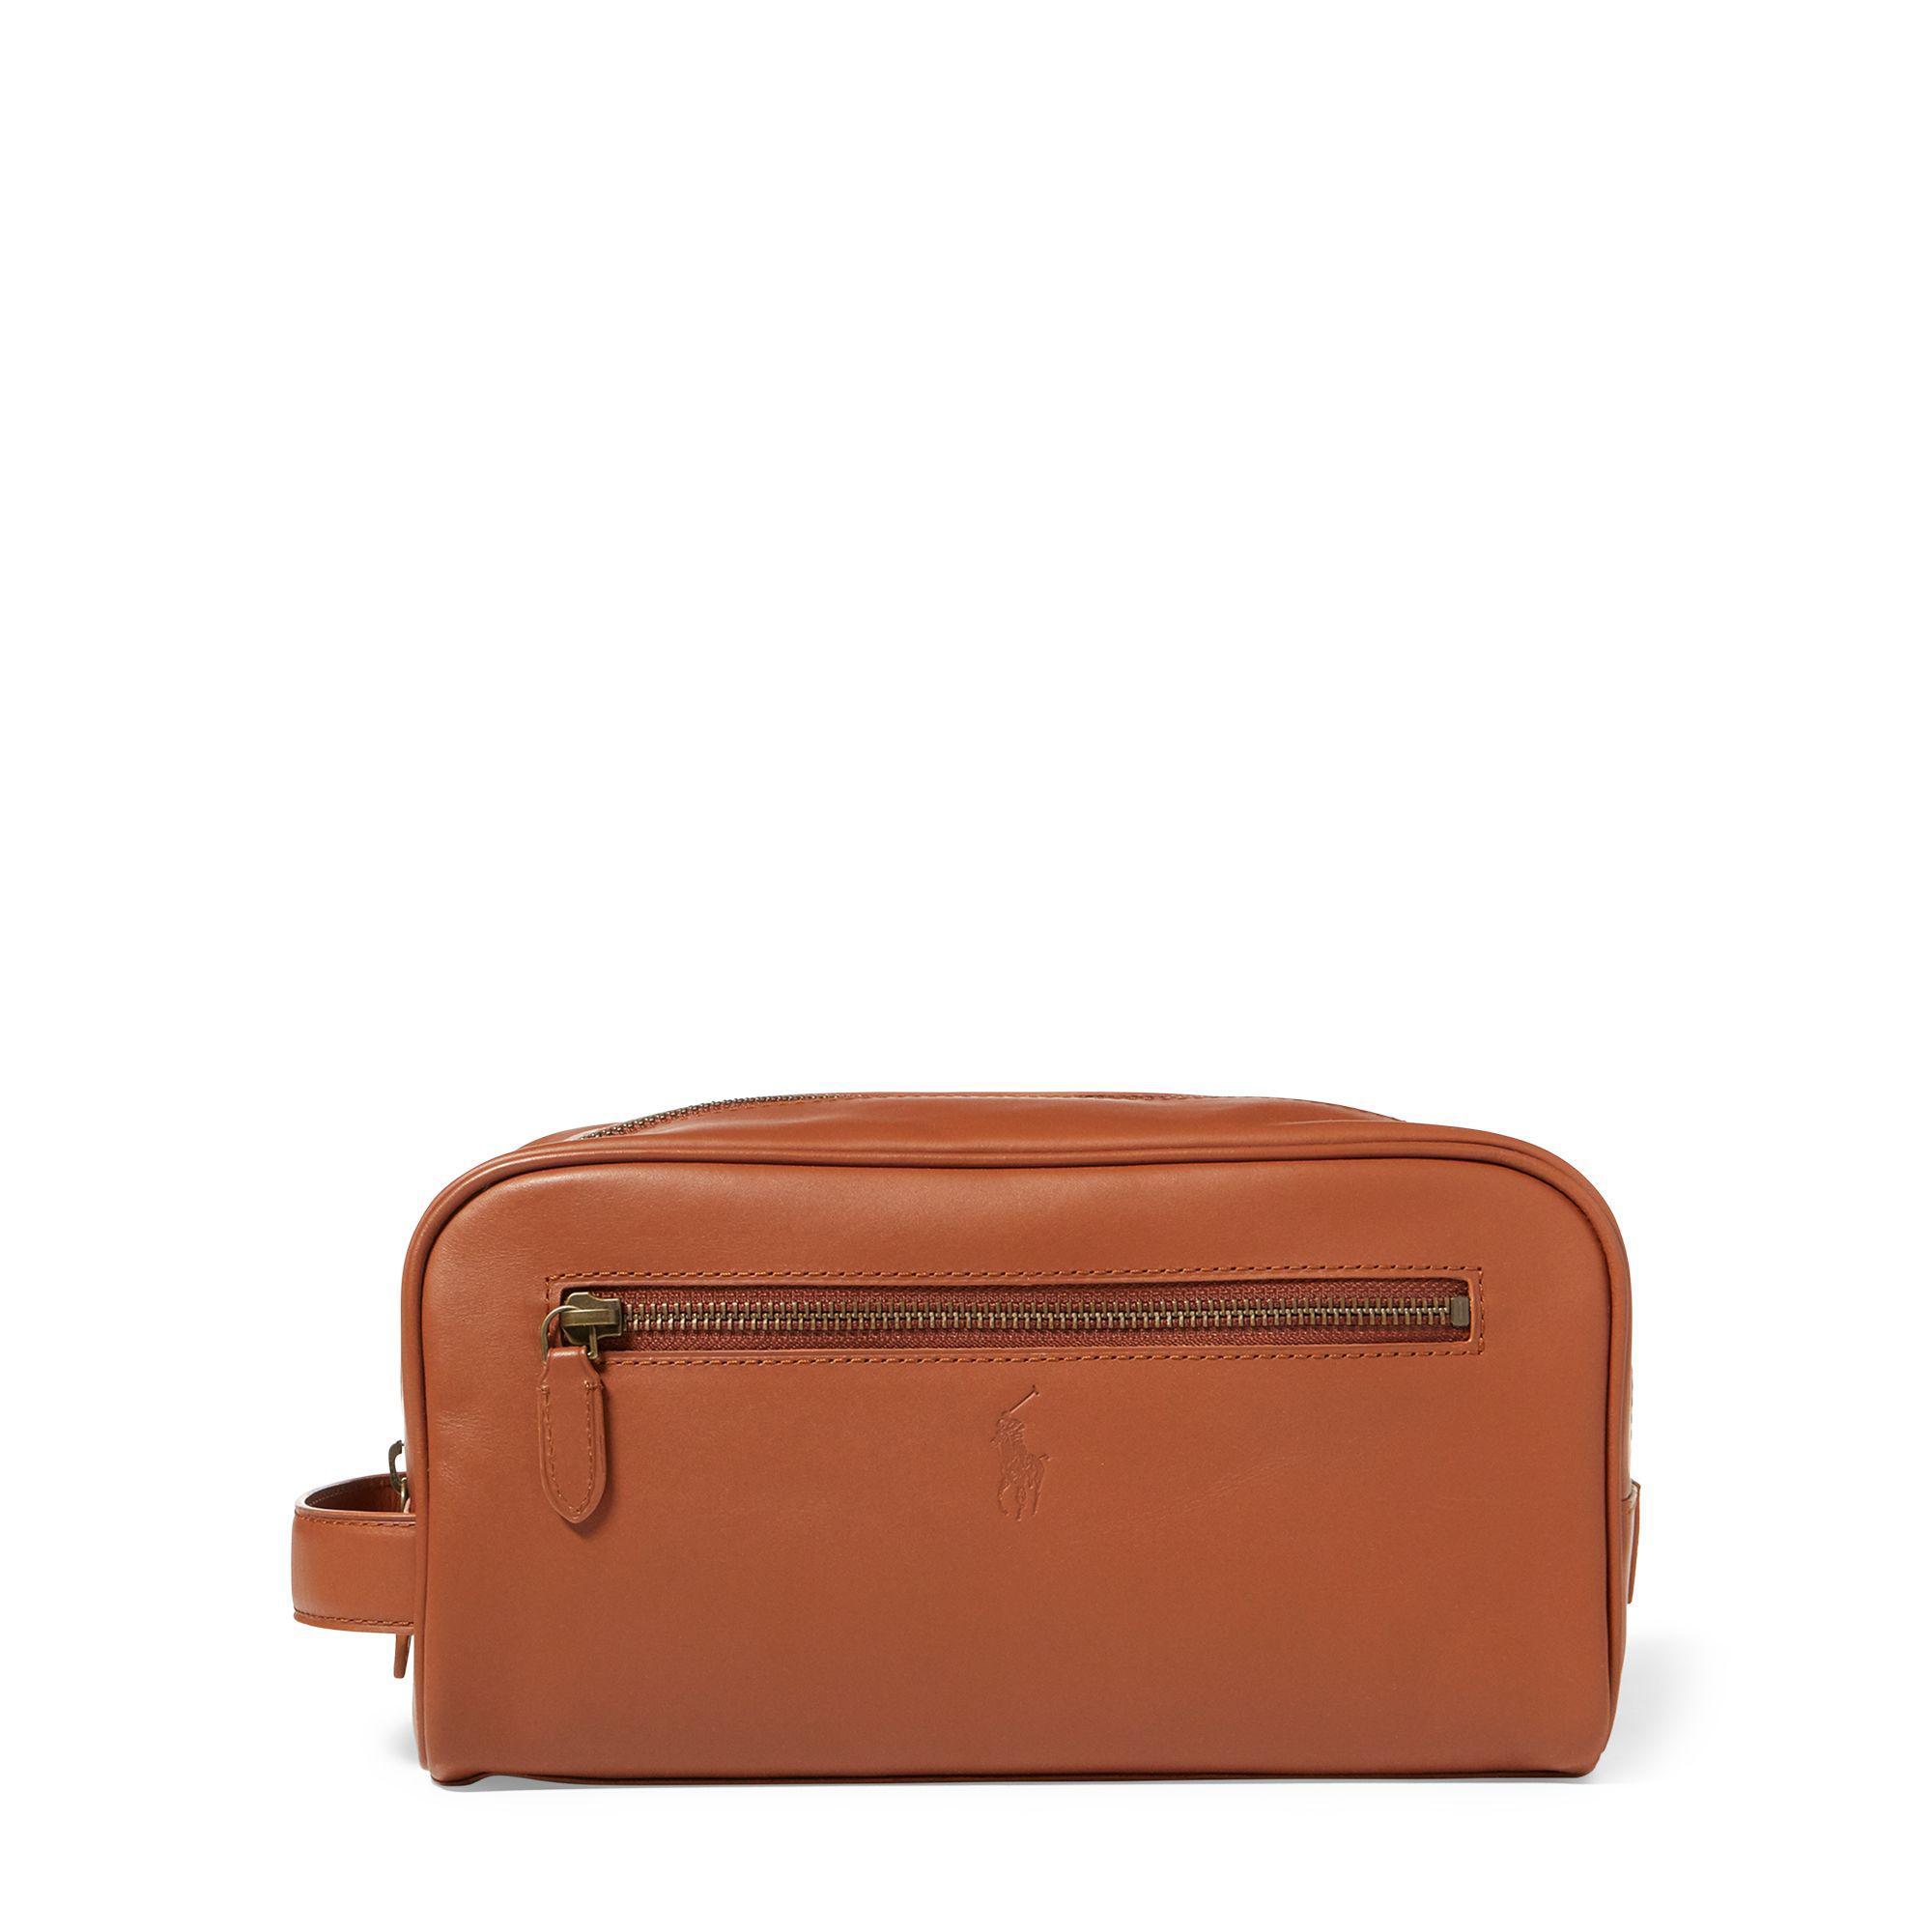 dc1f42084370 Polo Ralph Lauren Leather Shaving Kit in Brown for Men - Lyst